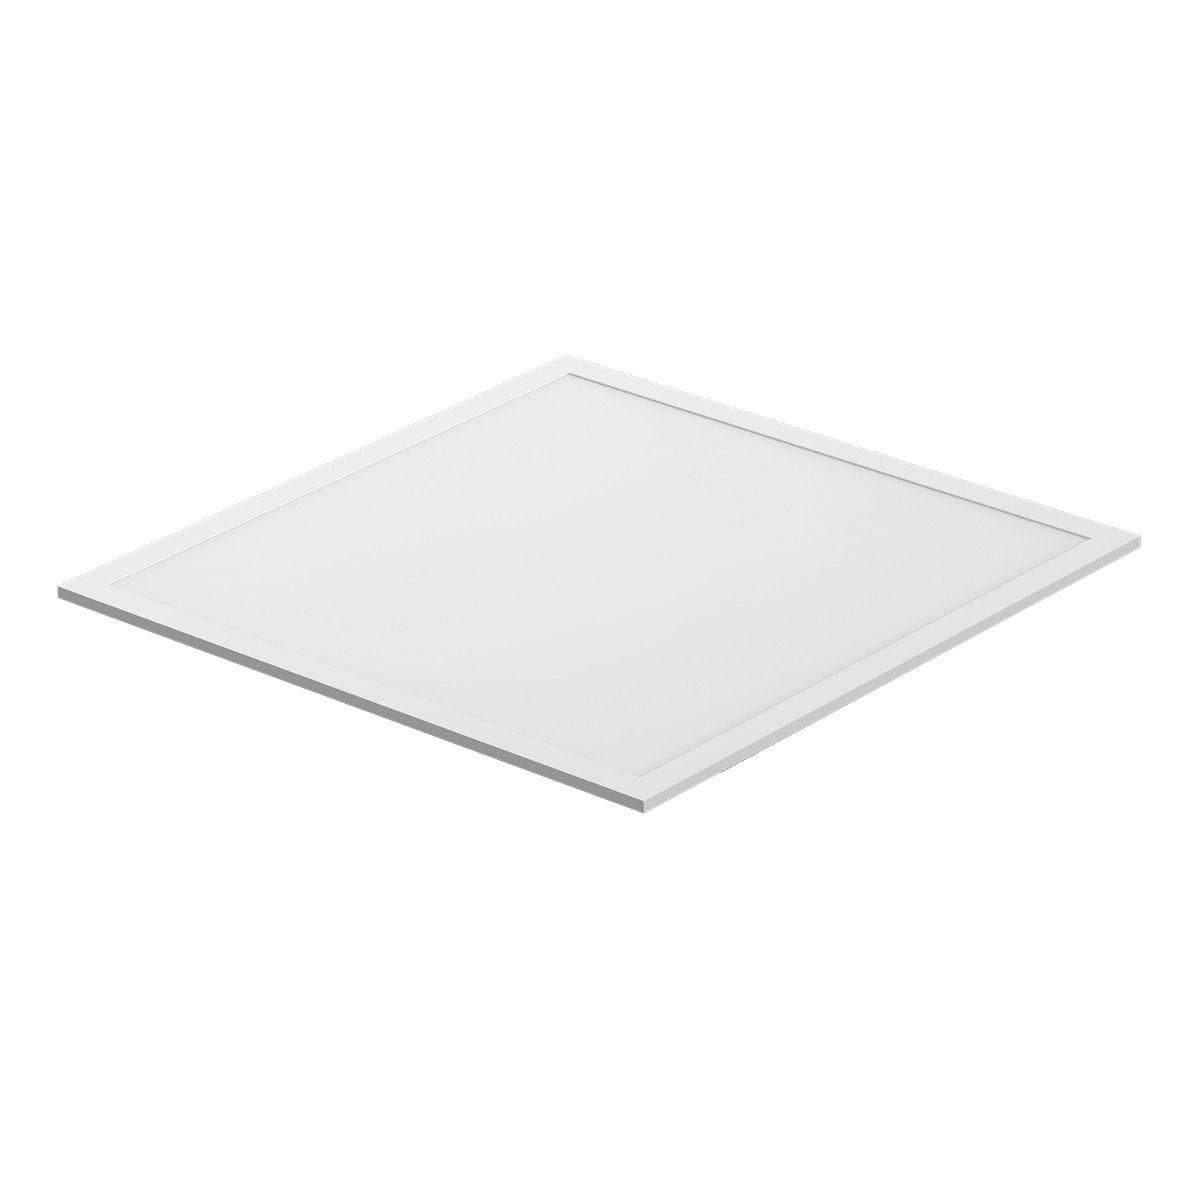 Noxion Panel LED Delta Pro V2.0 Xitanium DALI 30W 60x60cm 4000K 4110lm UGR <19   Dali Regulable - Blanco Frio - Reemplazo 4x18W